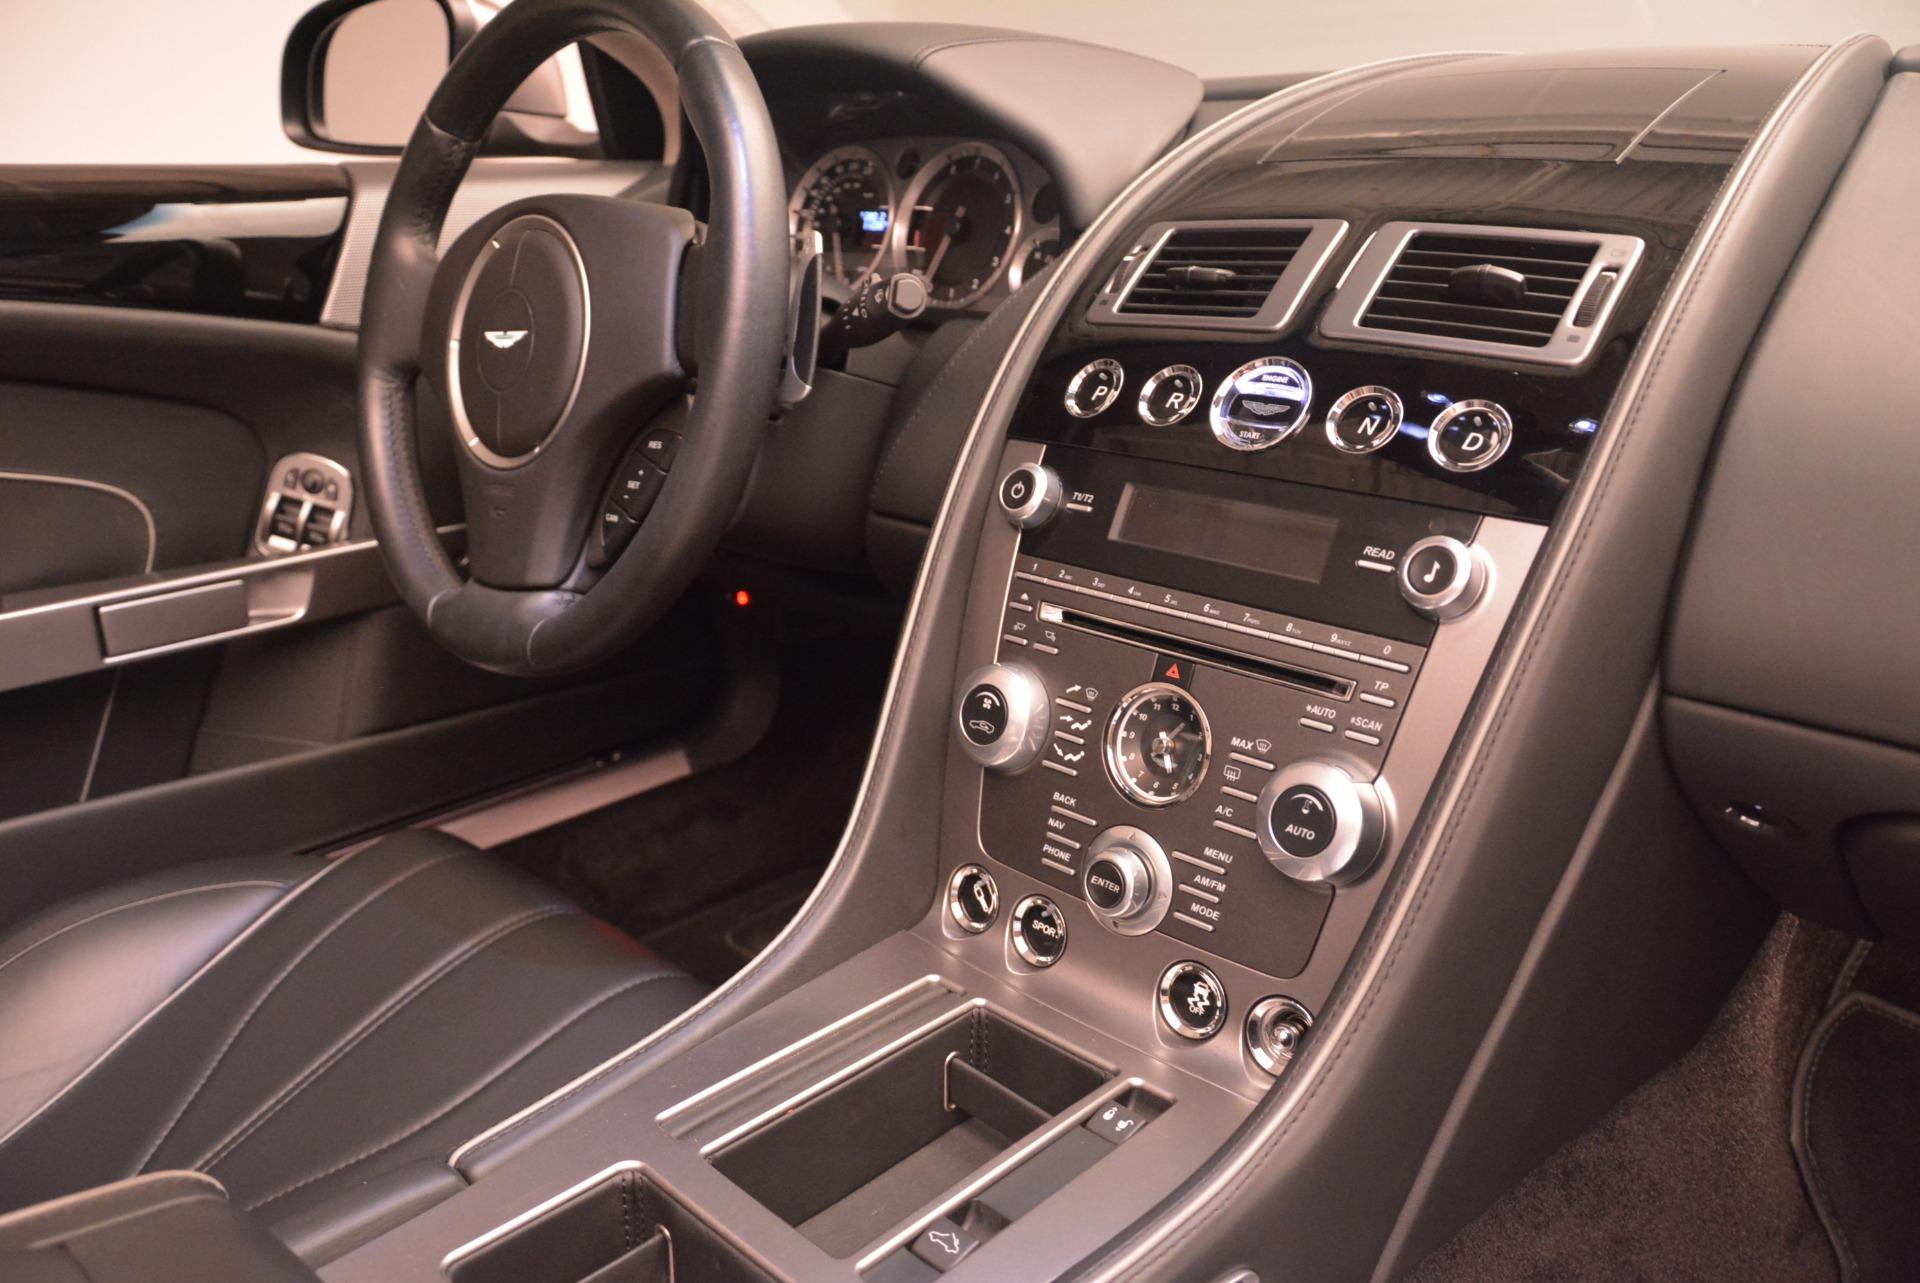 Used 2012 Aston Martin Virage Volante For Sale In Westport, CT 2378_p30